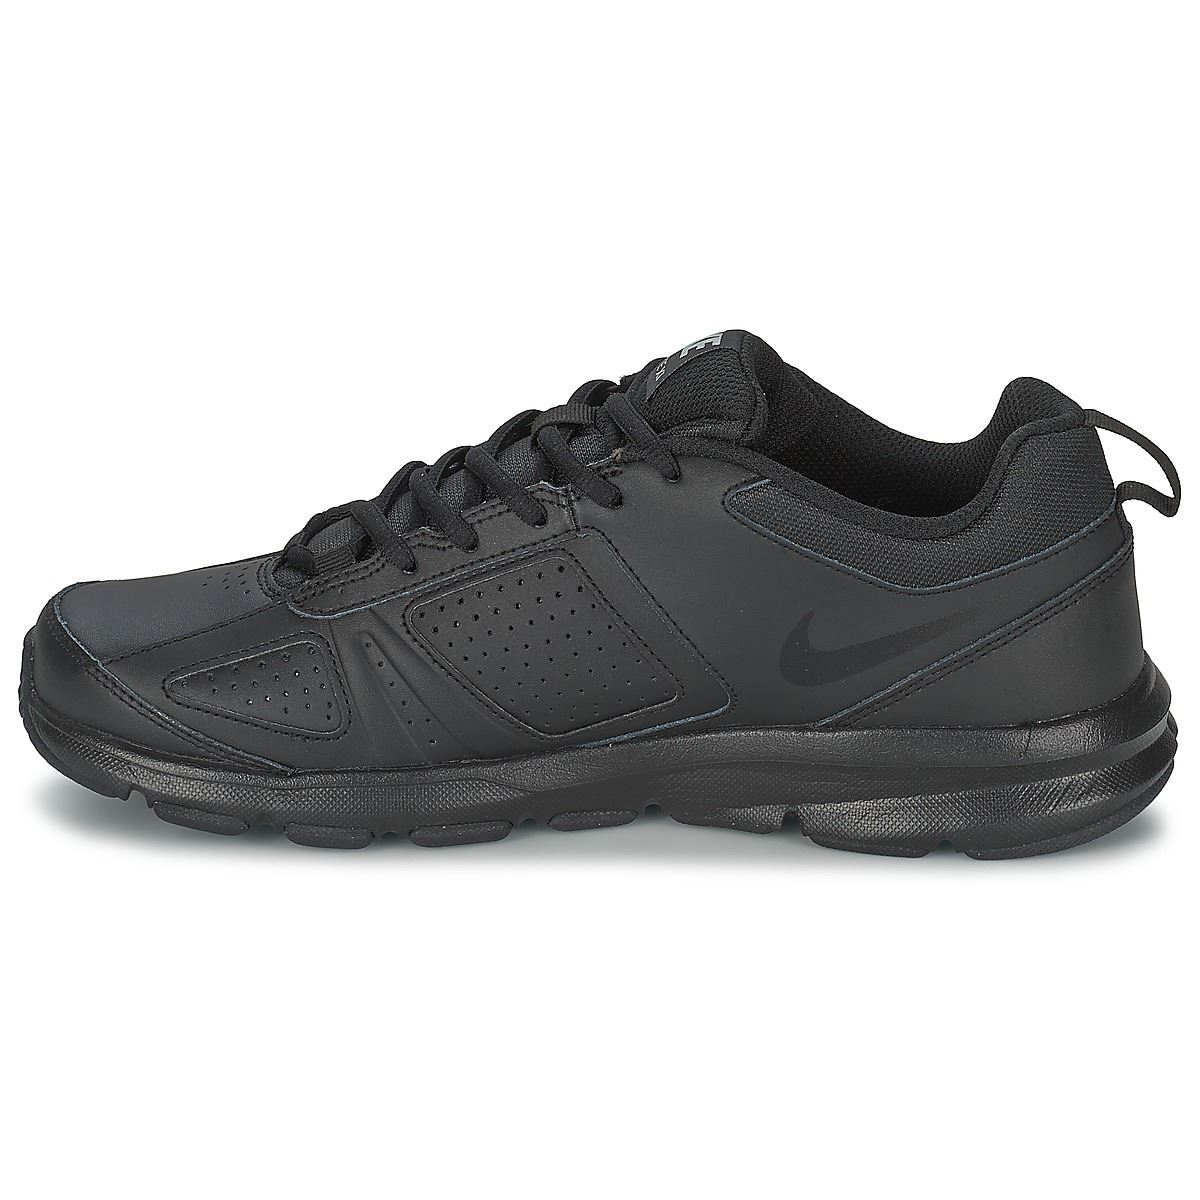 Nike trainers t lite xi women s sneakers sports runing shoes black - Nike Trainers T Lite Xi Women S Sneakers Sports Runing Shoes Black 49